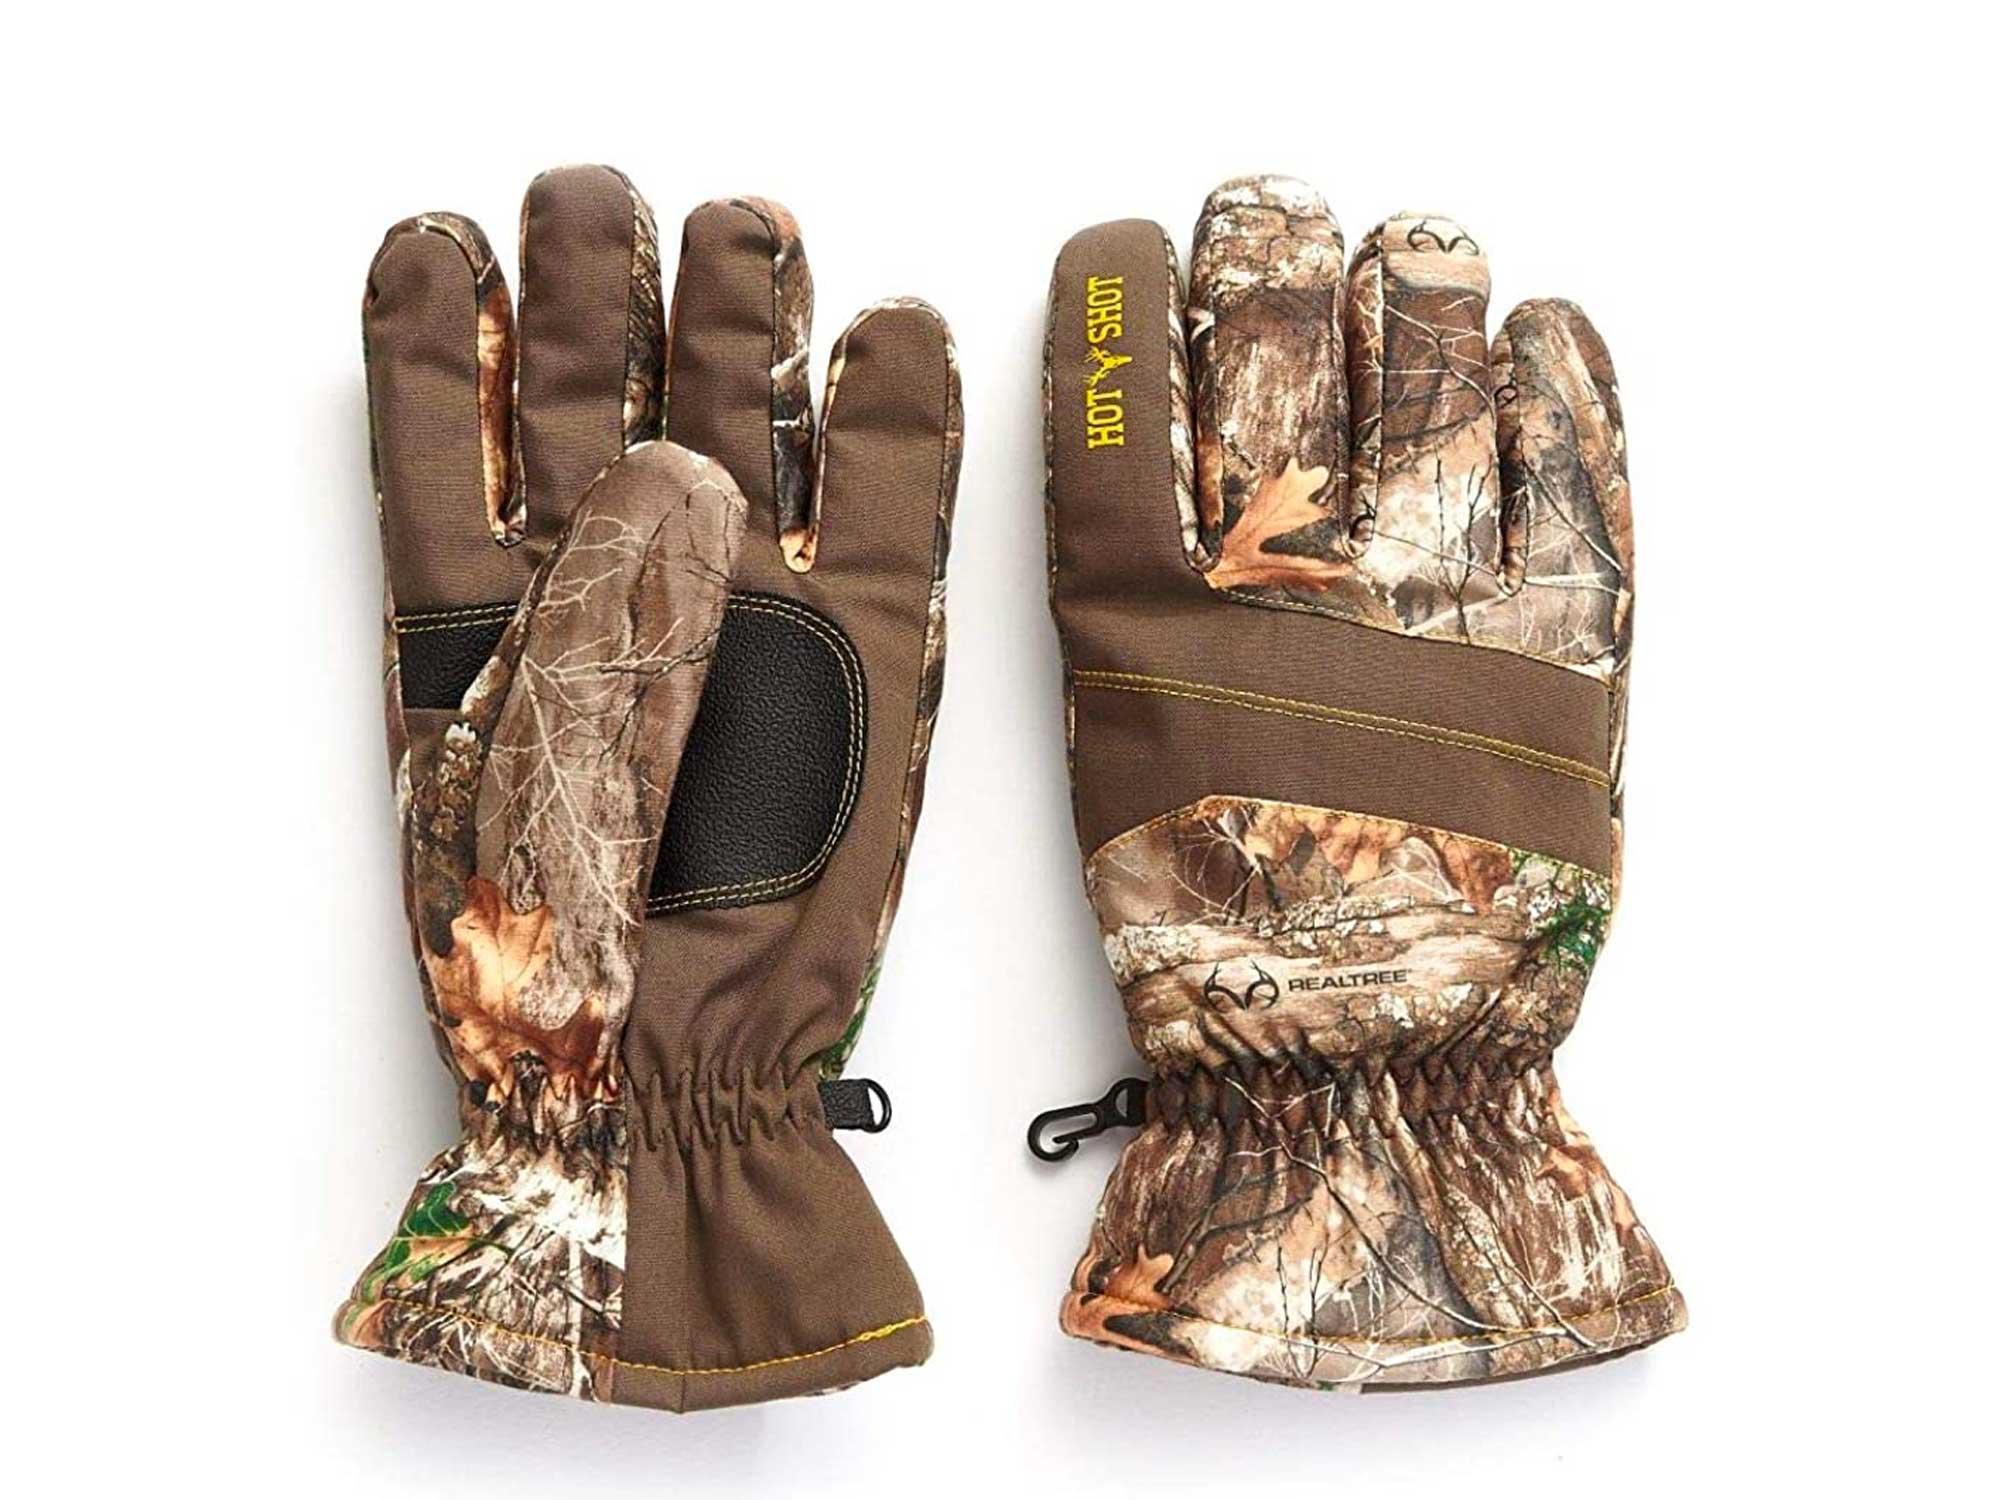 Hot Shot hunting gloves